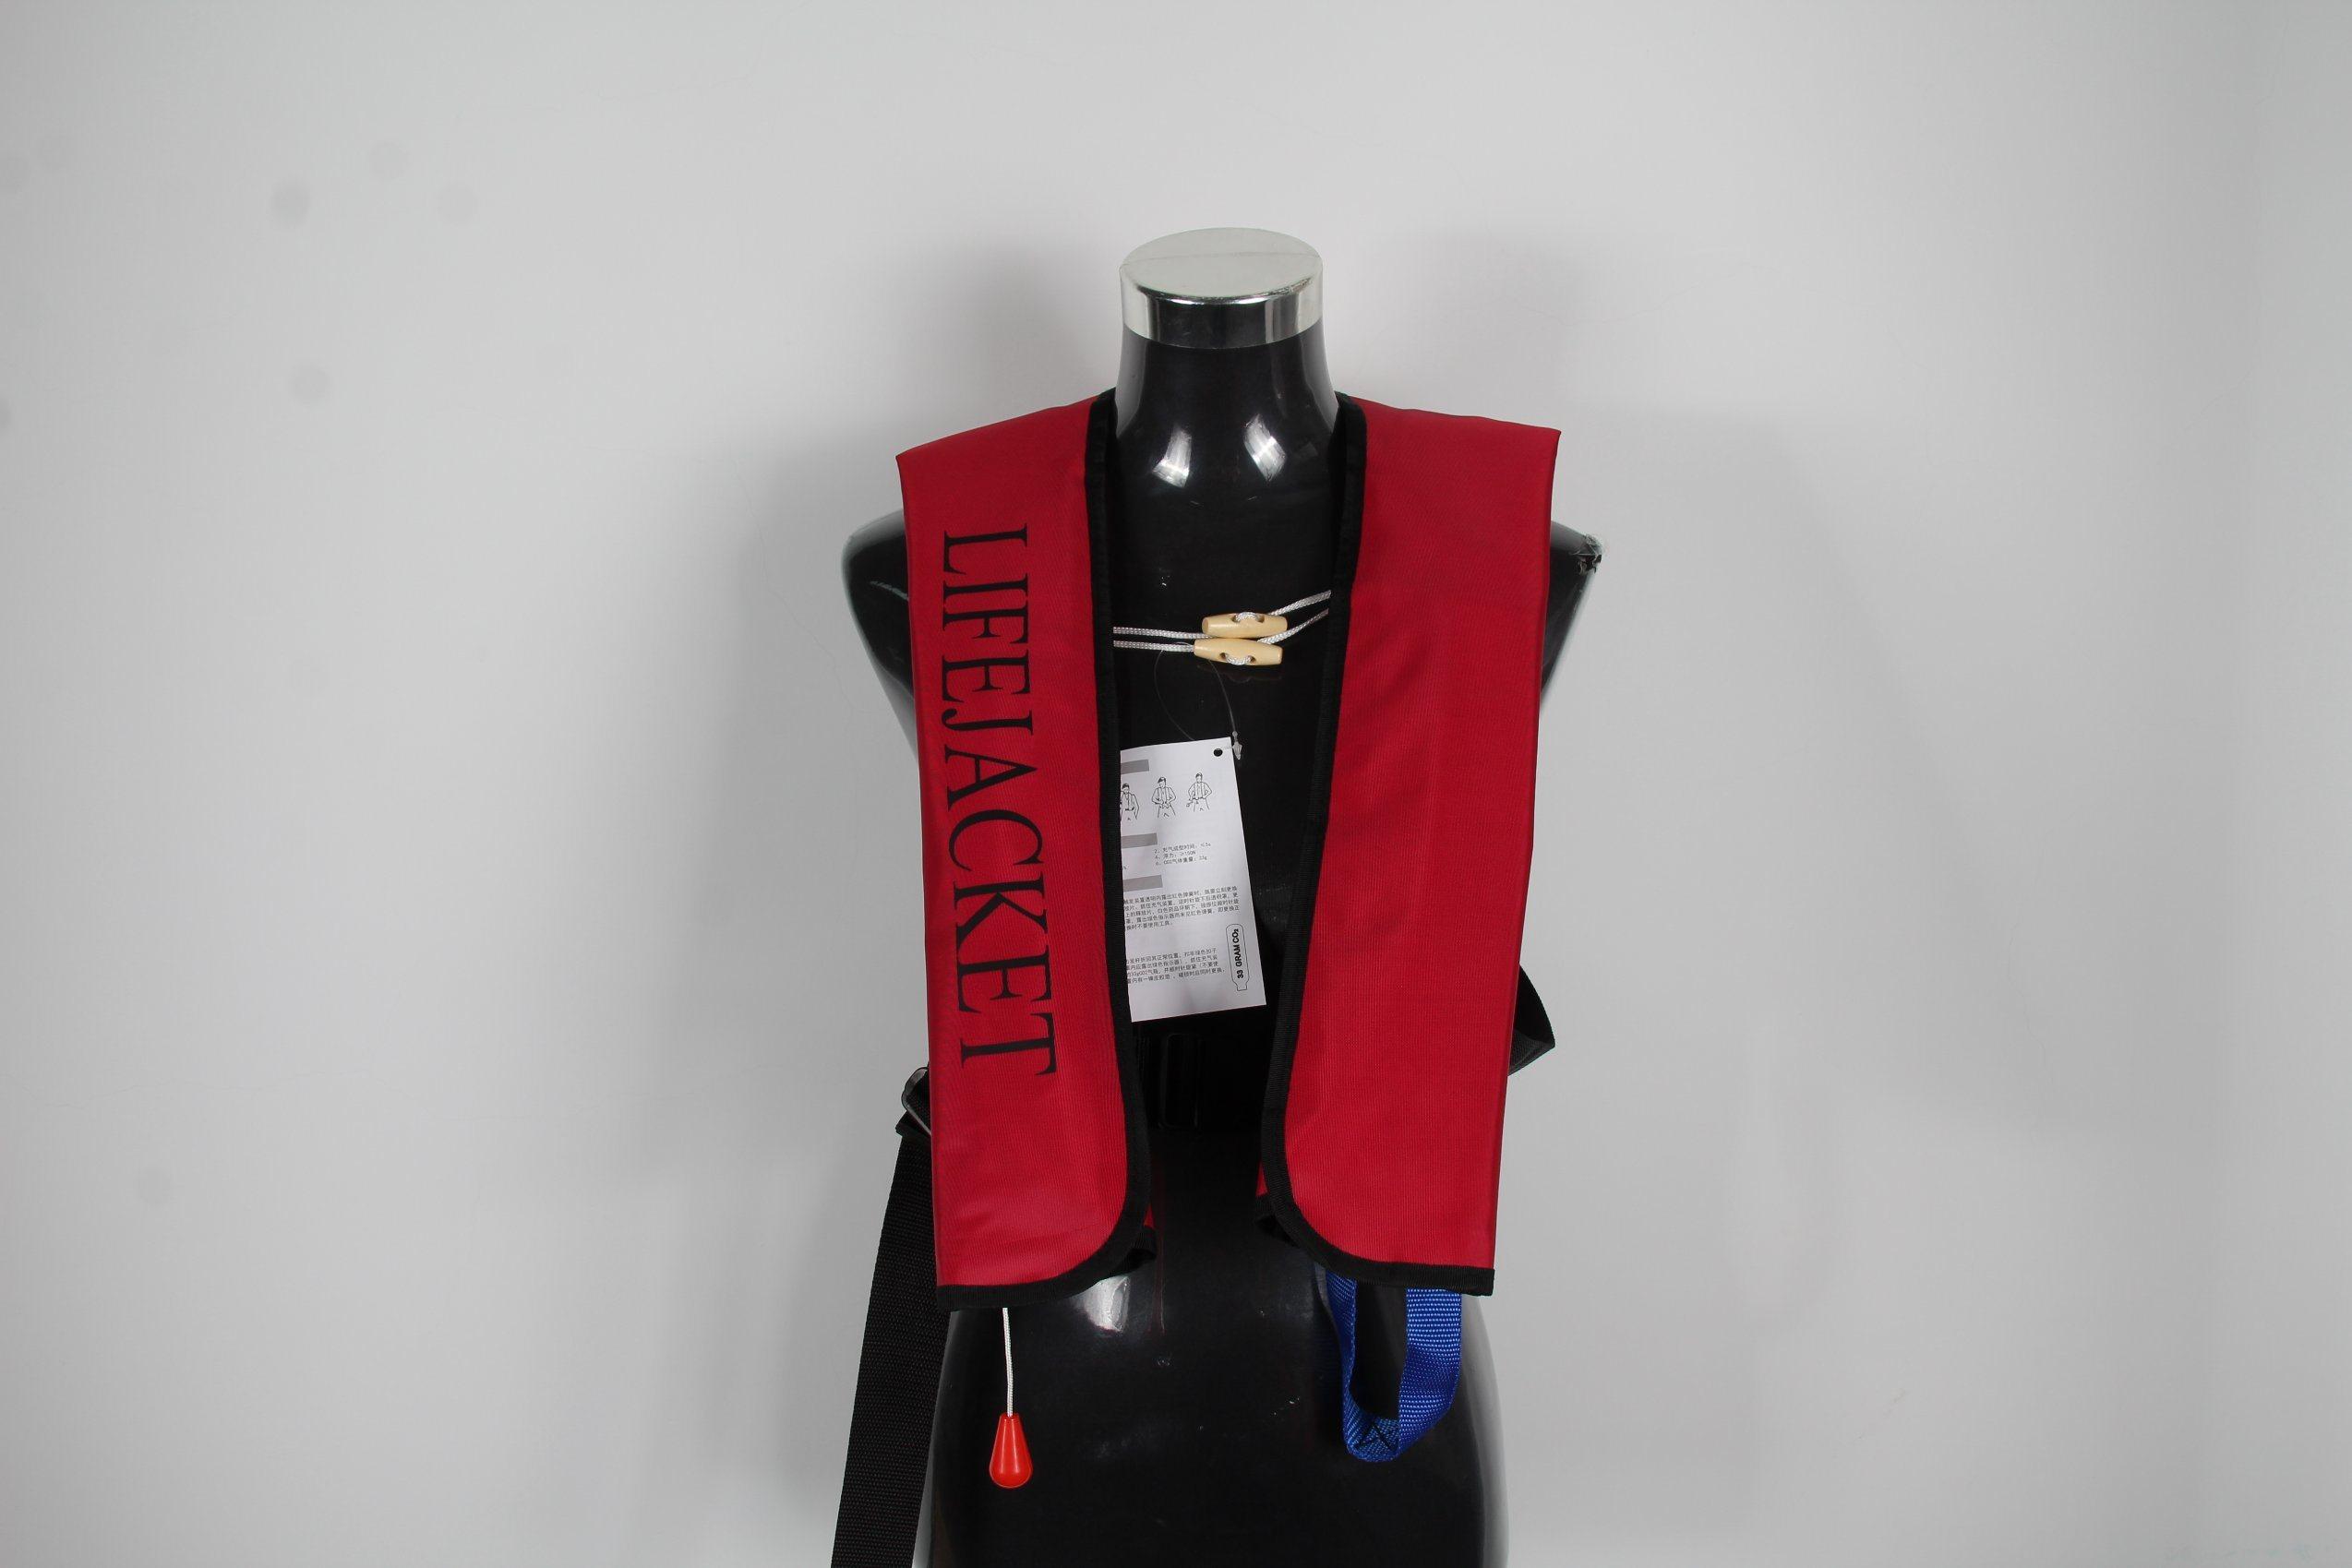 cab31a00e5de (Counter Genuine) Radii Straight Jacket Purple Black – White Shoes